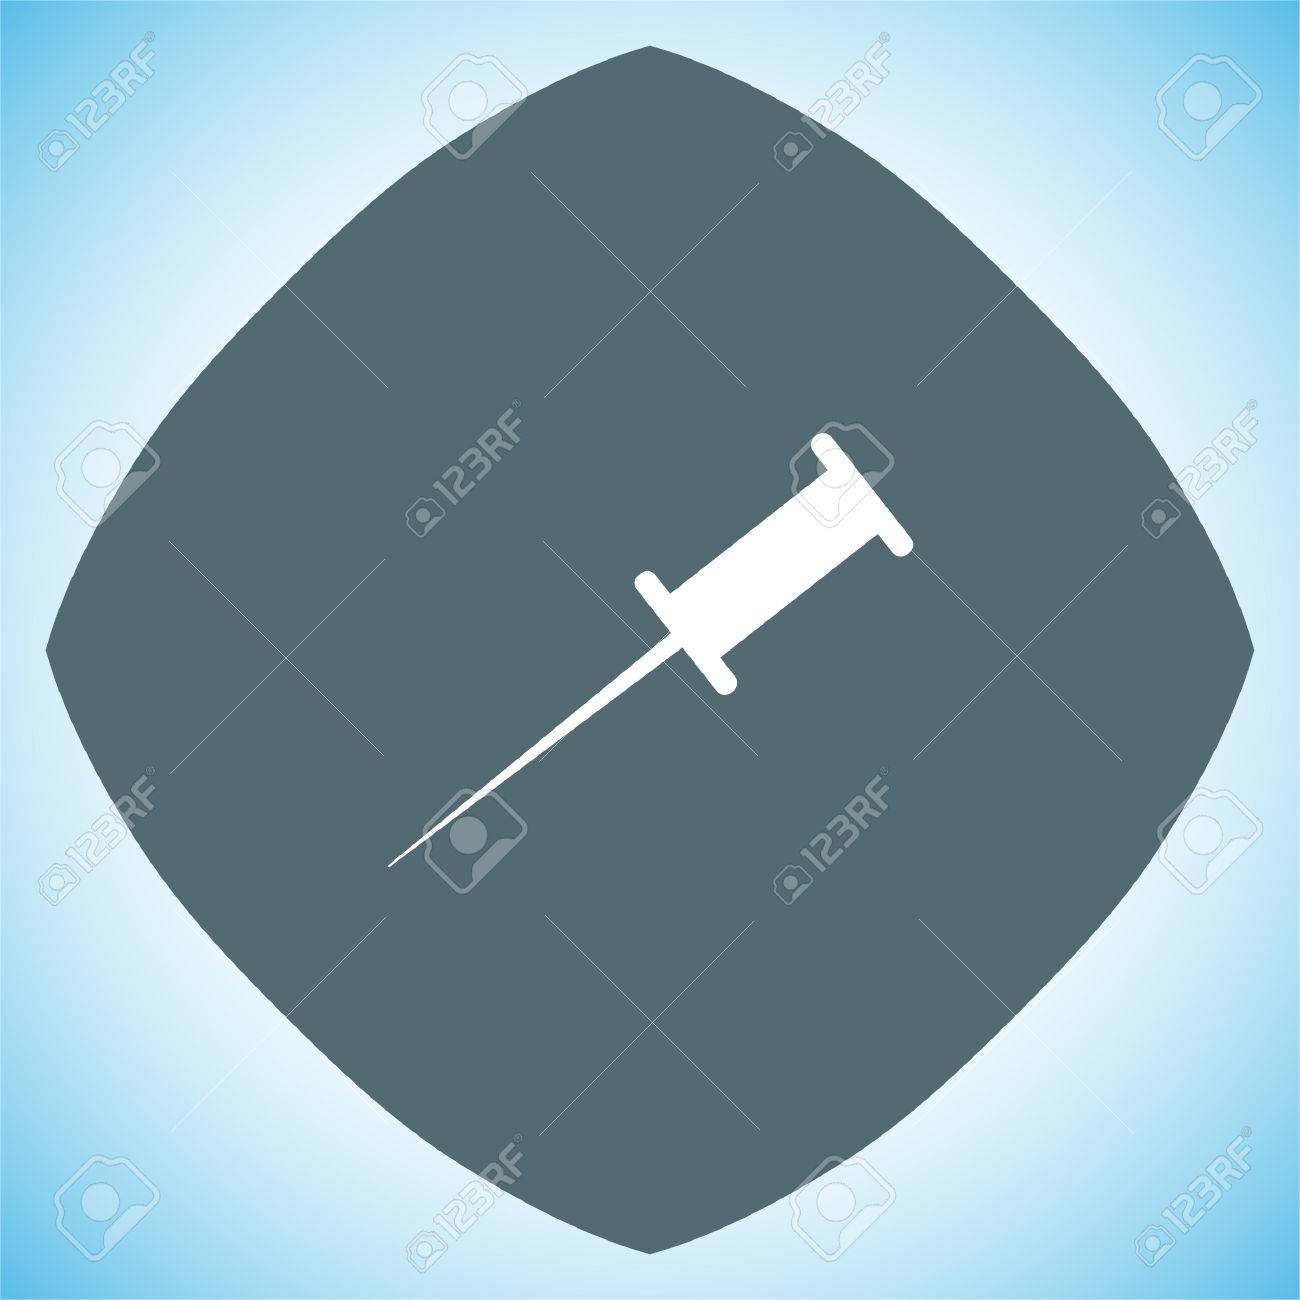 Pushpin vector icon. Needle sign. Bulletin board note symbol - 66839069